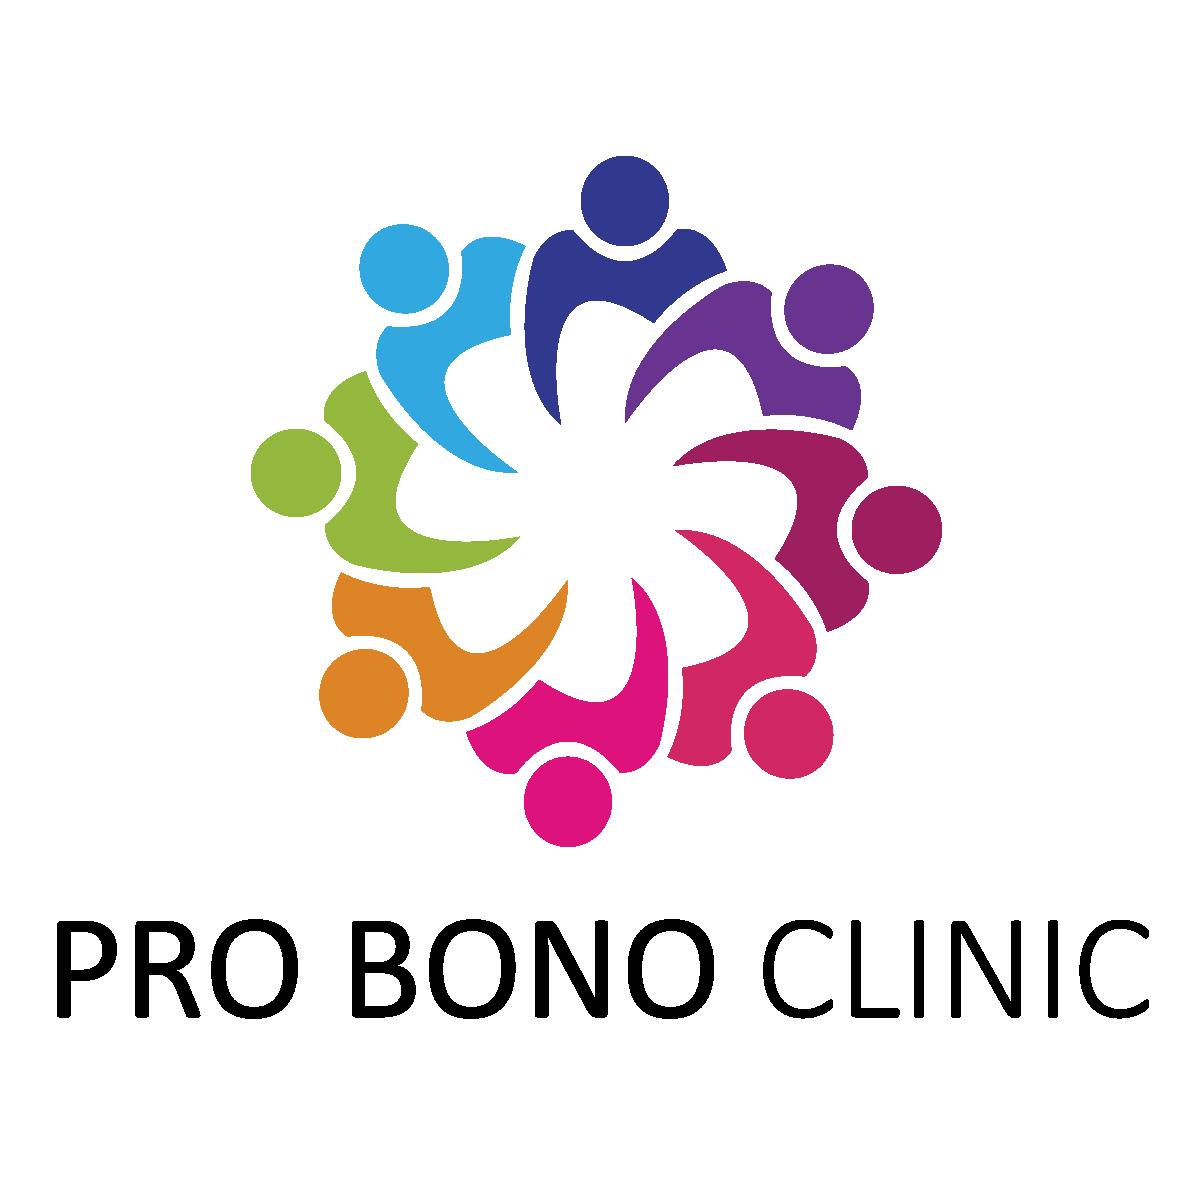 Pro Bono Clinic logo- square